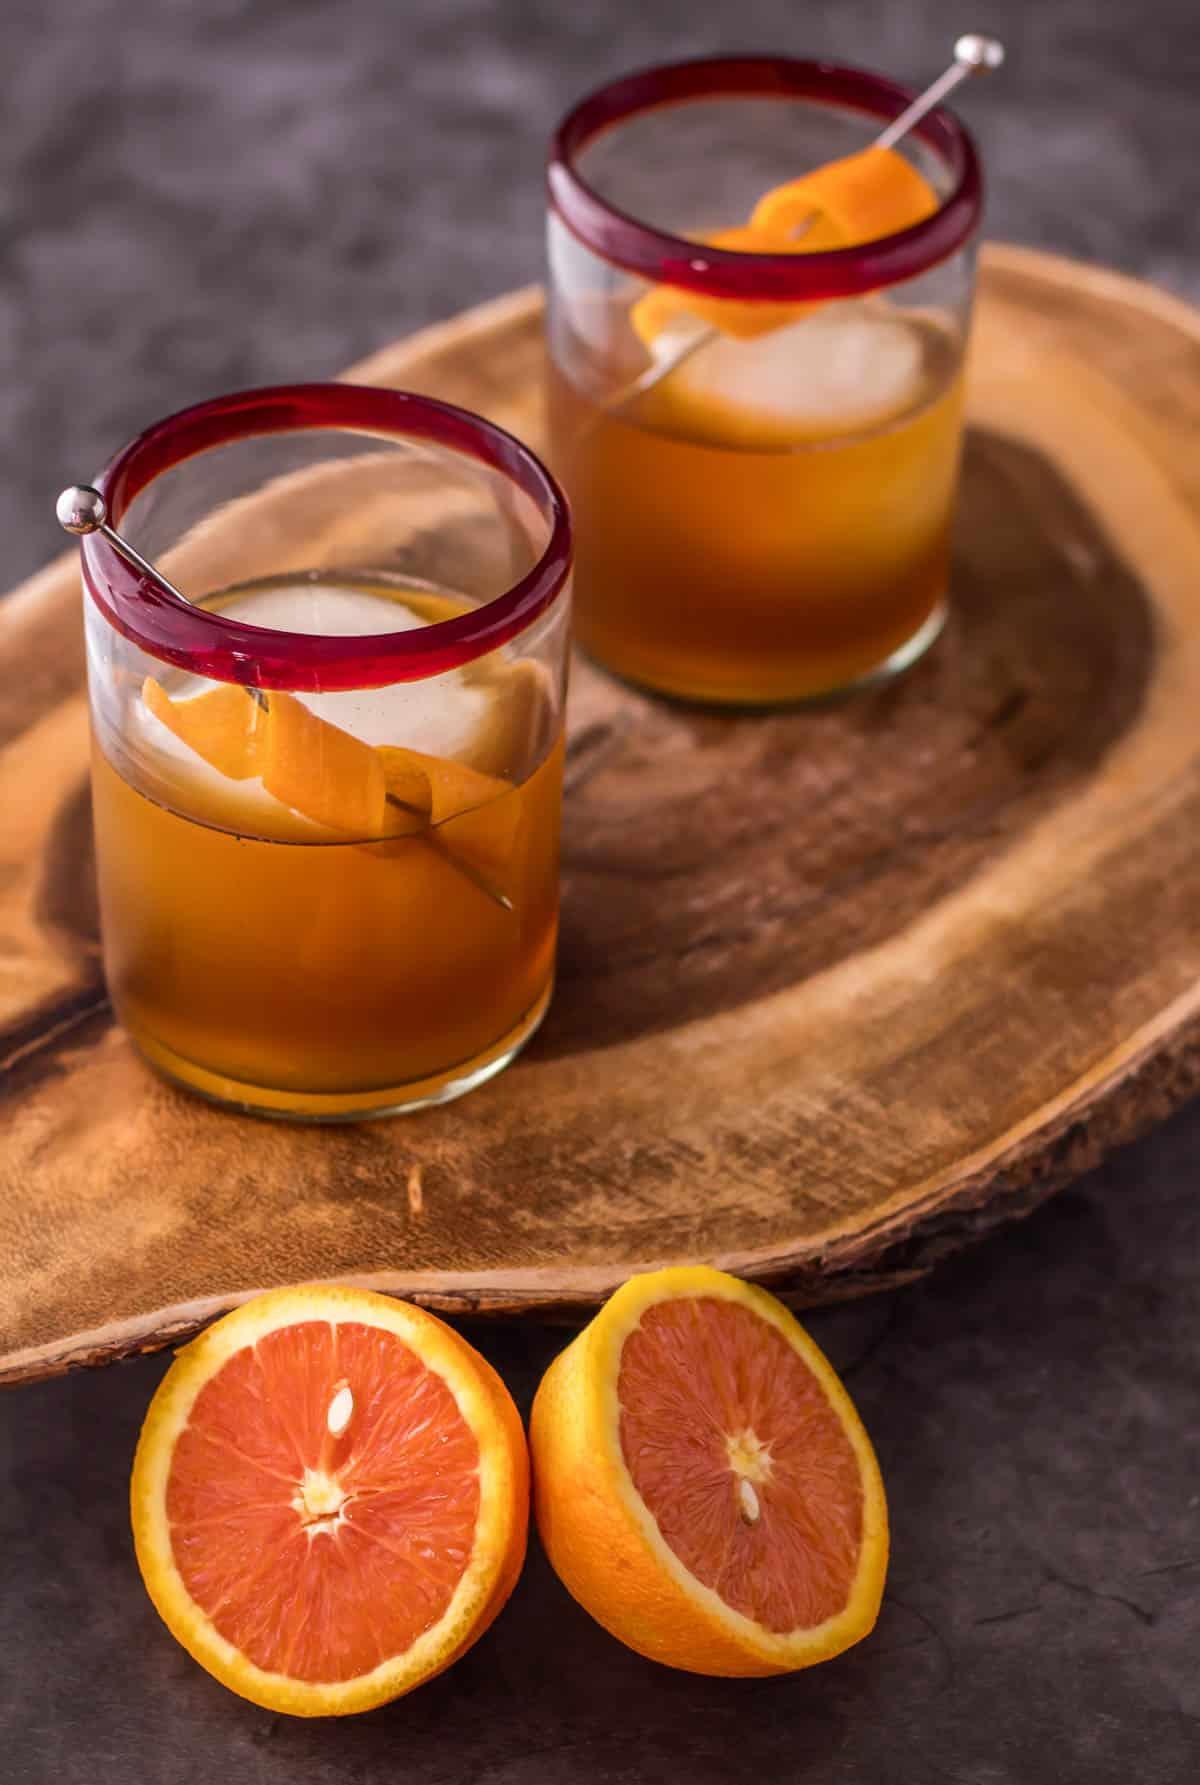 A burl wood cutting board orange pomegranate Manhattans in rocks glasses, garnished with a spiralized orange peel.